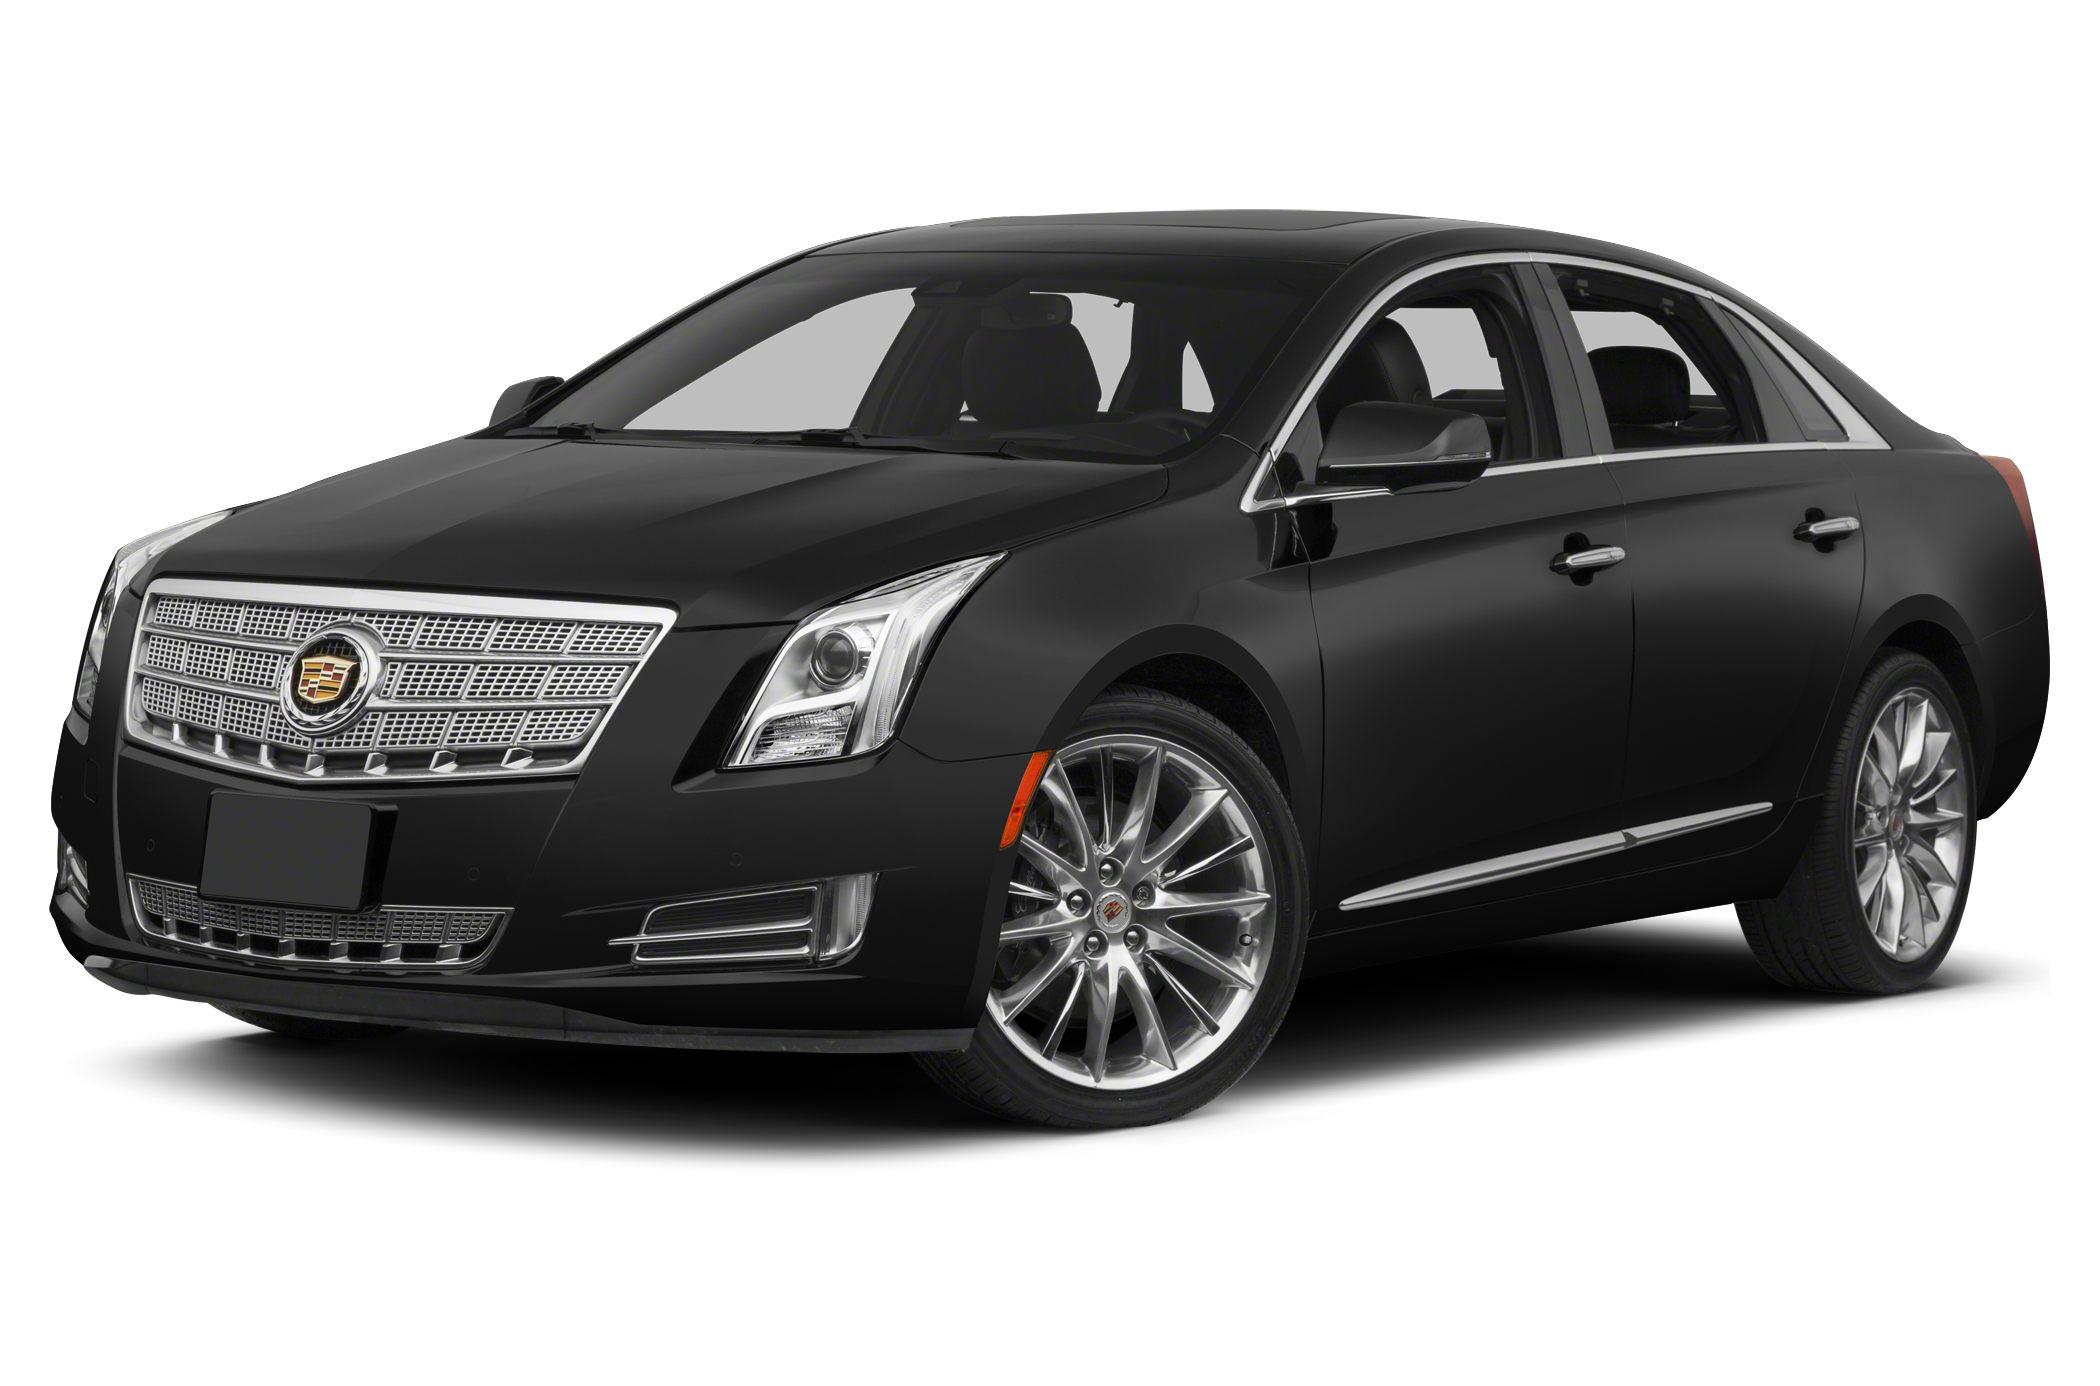 2014 Cadillac XTS Vsport Platinum The THUNDER has come to Bartow Florida 2014 Cadillac XTS Vspor